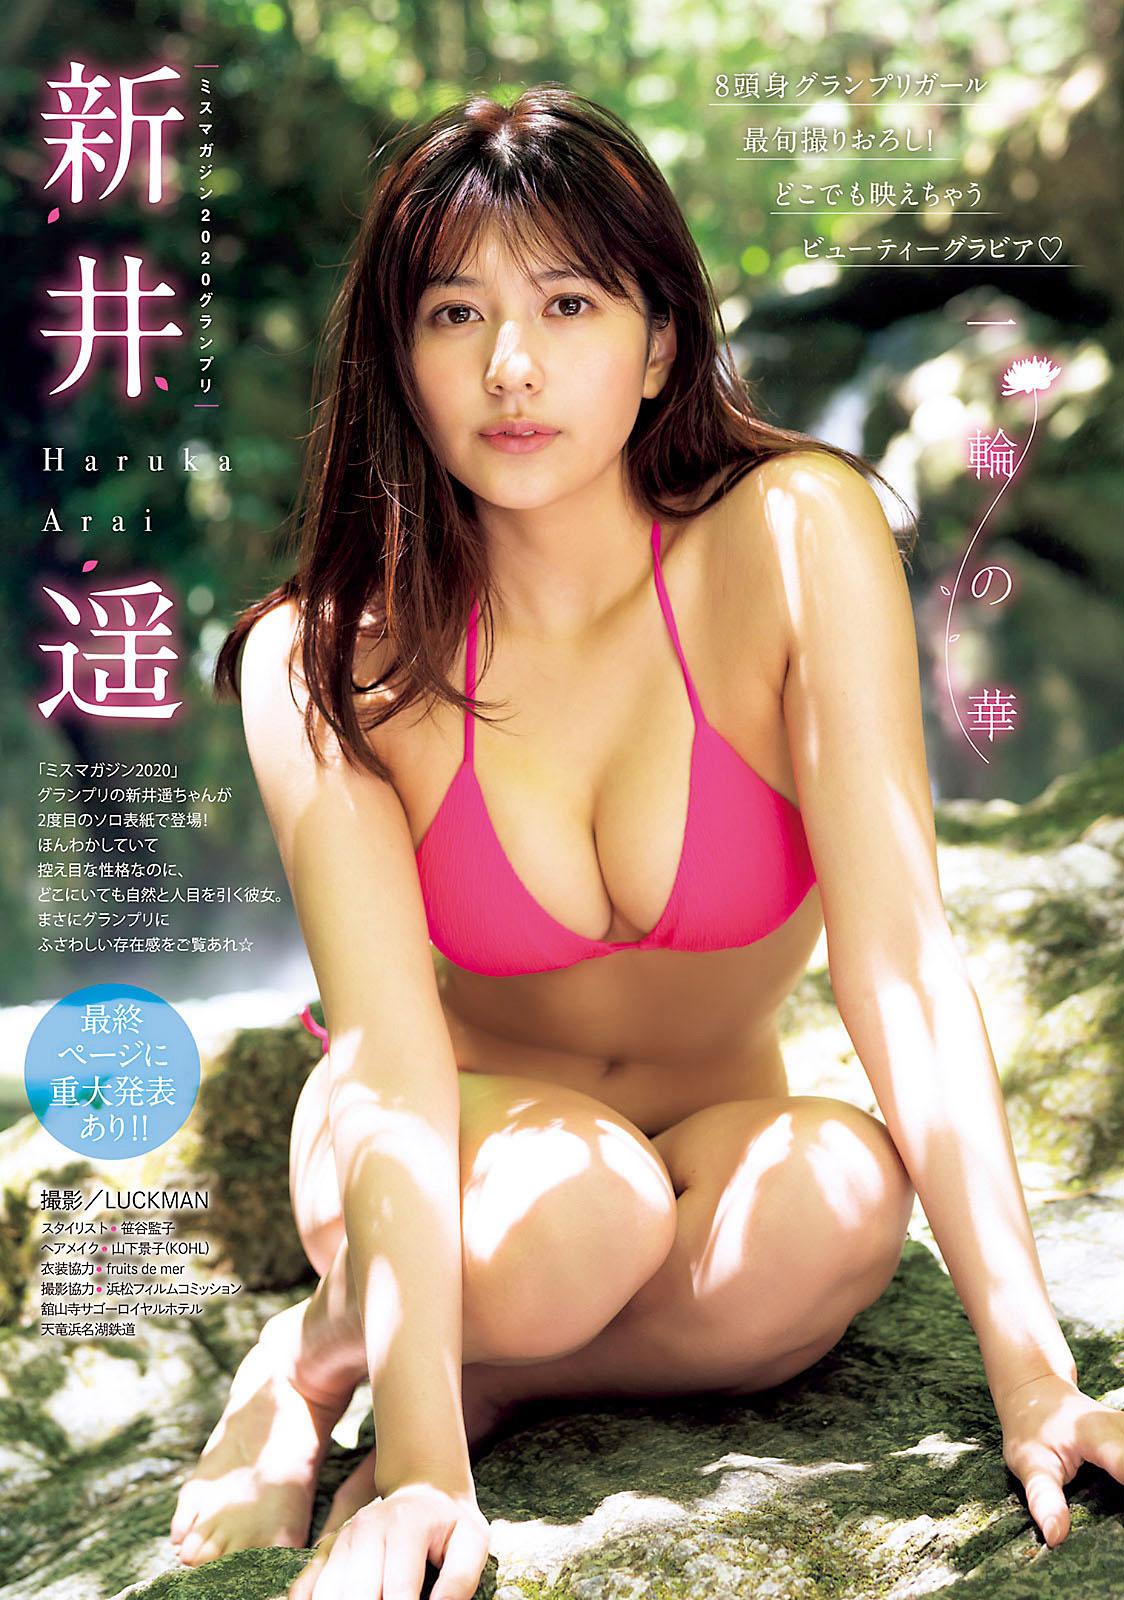 Haruka Arai Young Magazine 210712 02.jpg